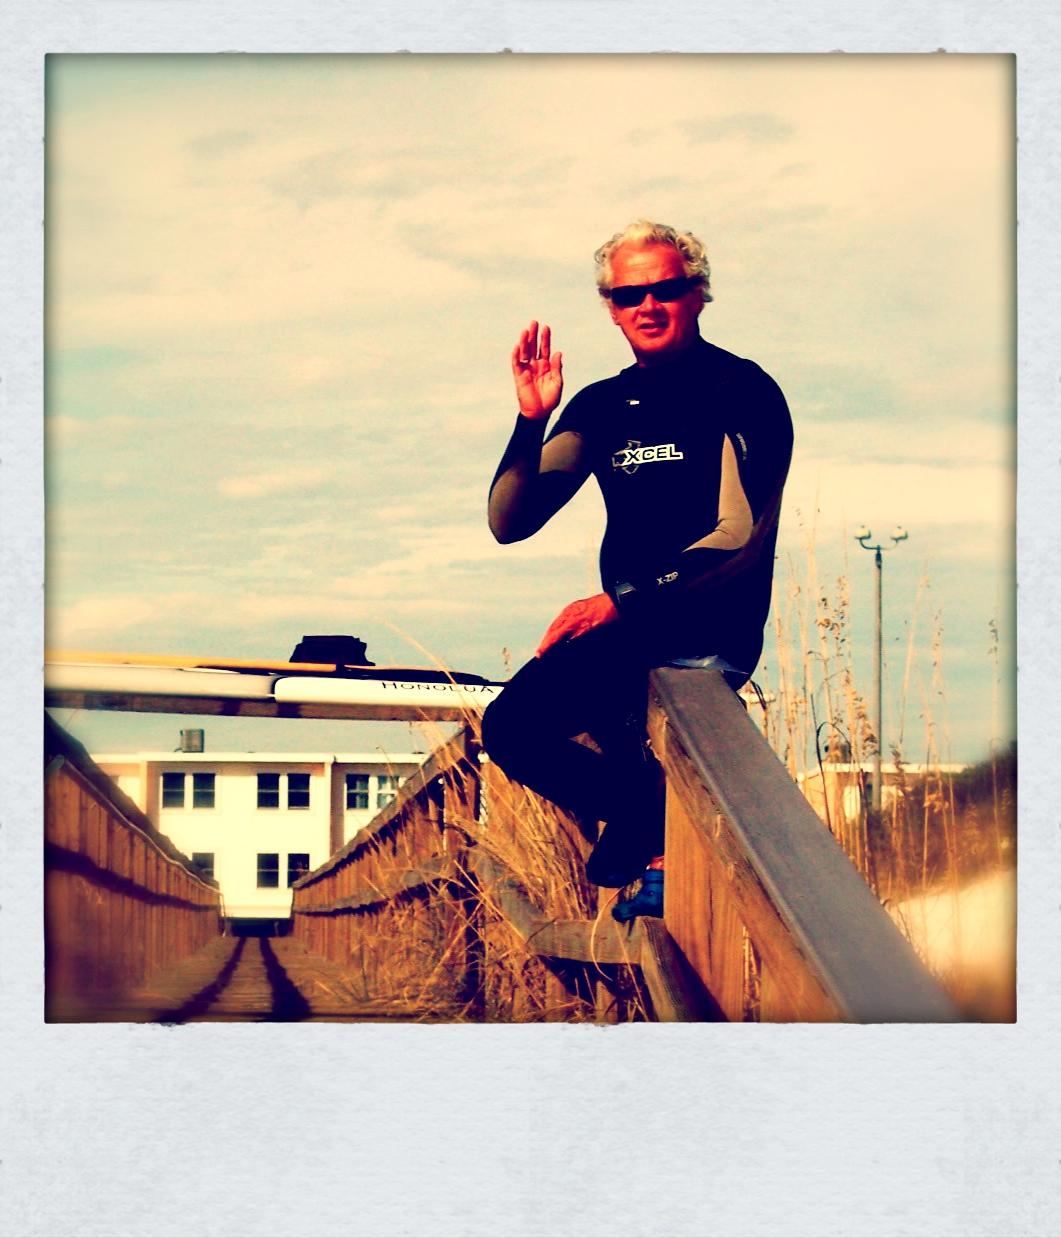 2011-10-09-mindsurfing1.JPG